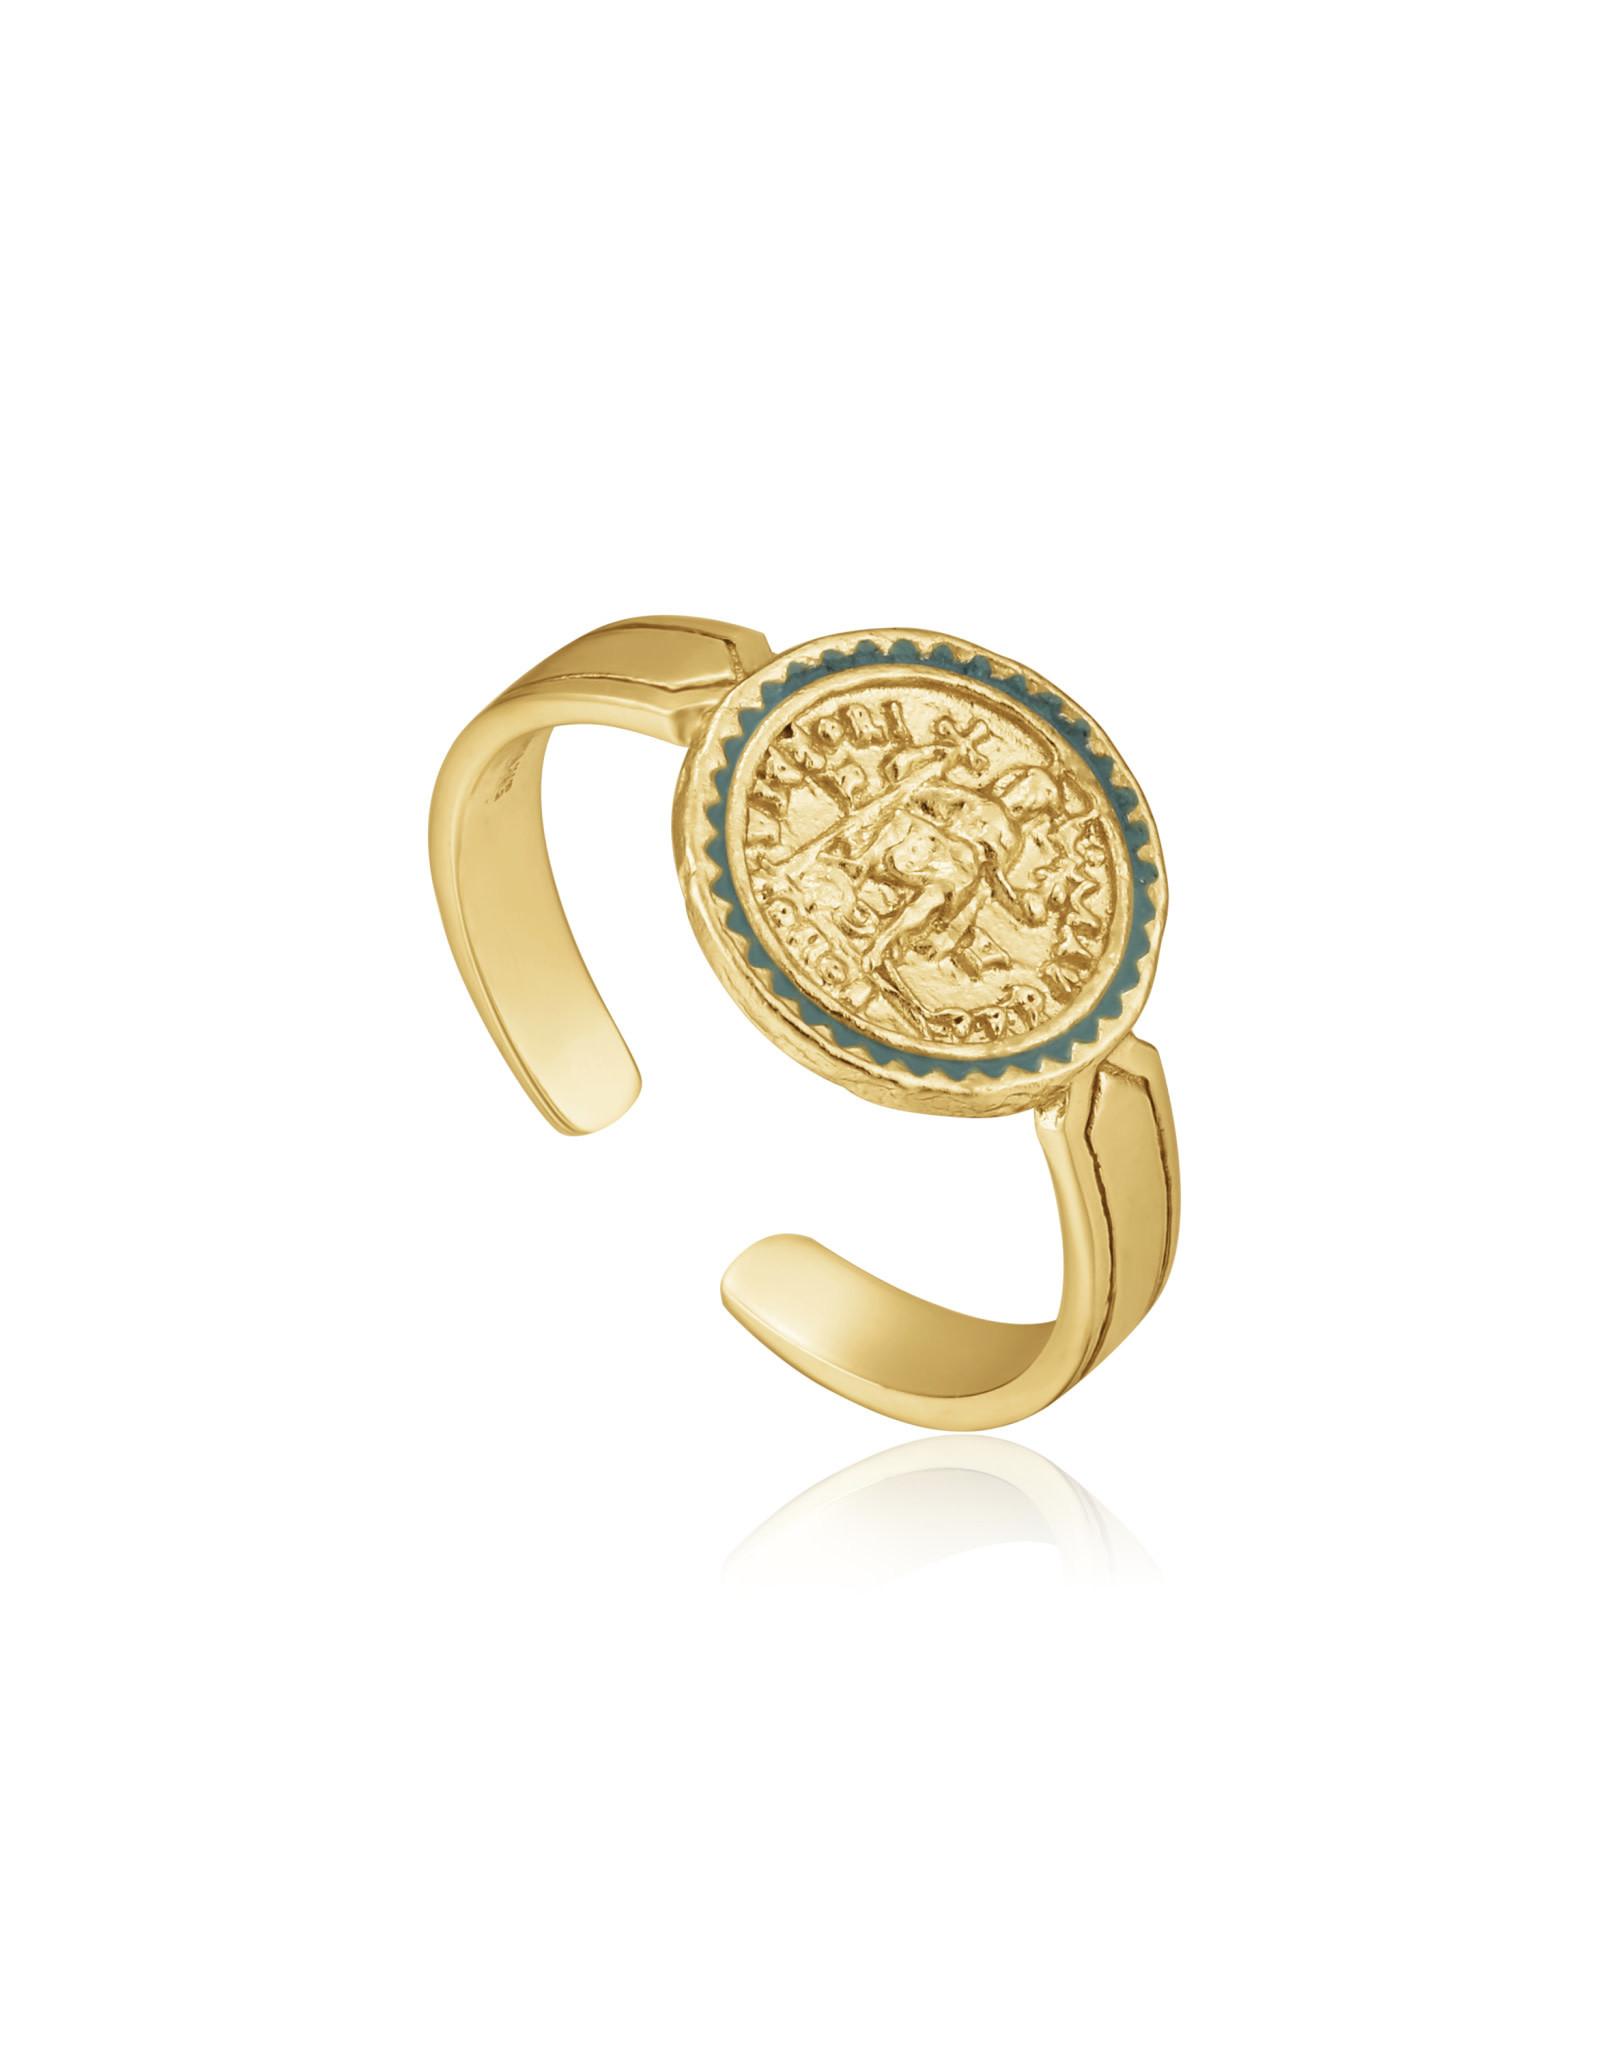 Ania Haie Ania Hiae - Glow adjustable ring